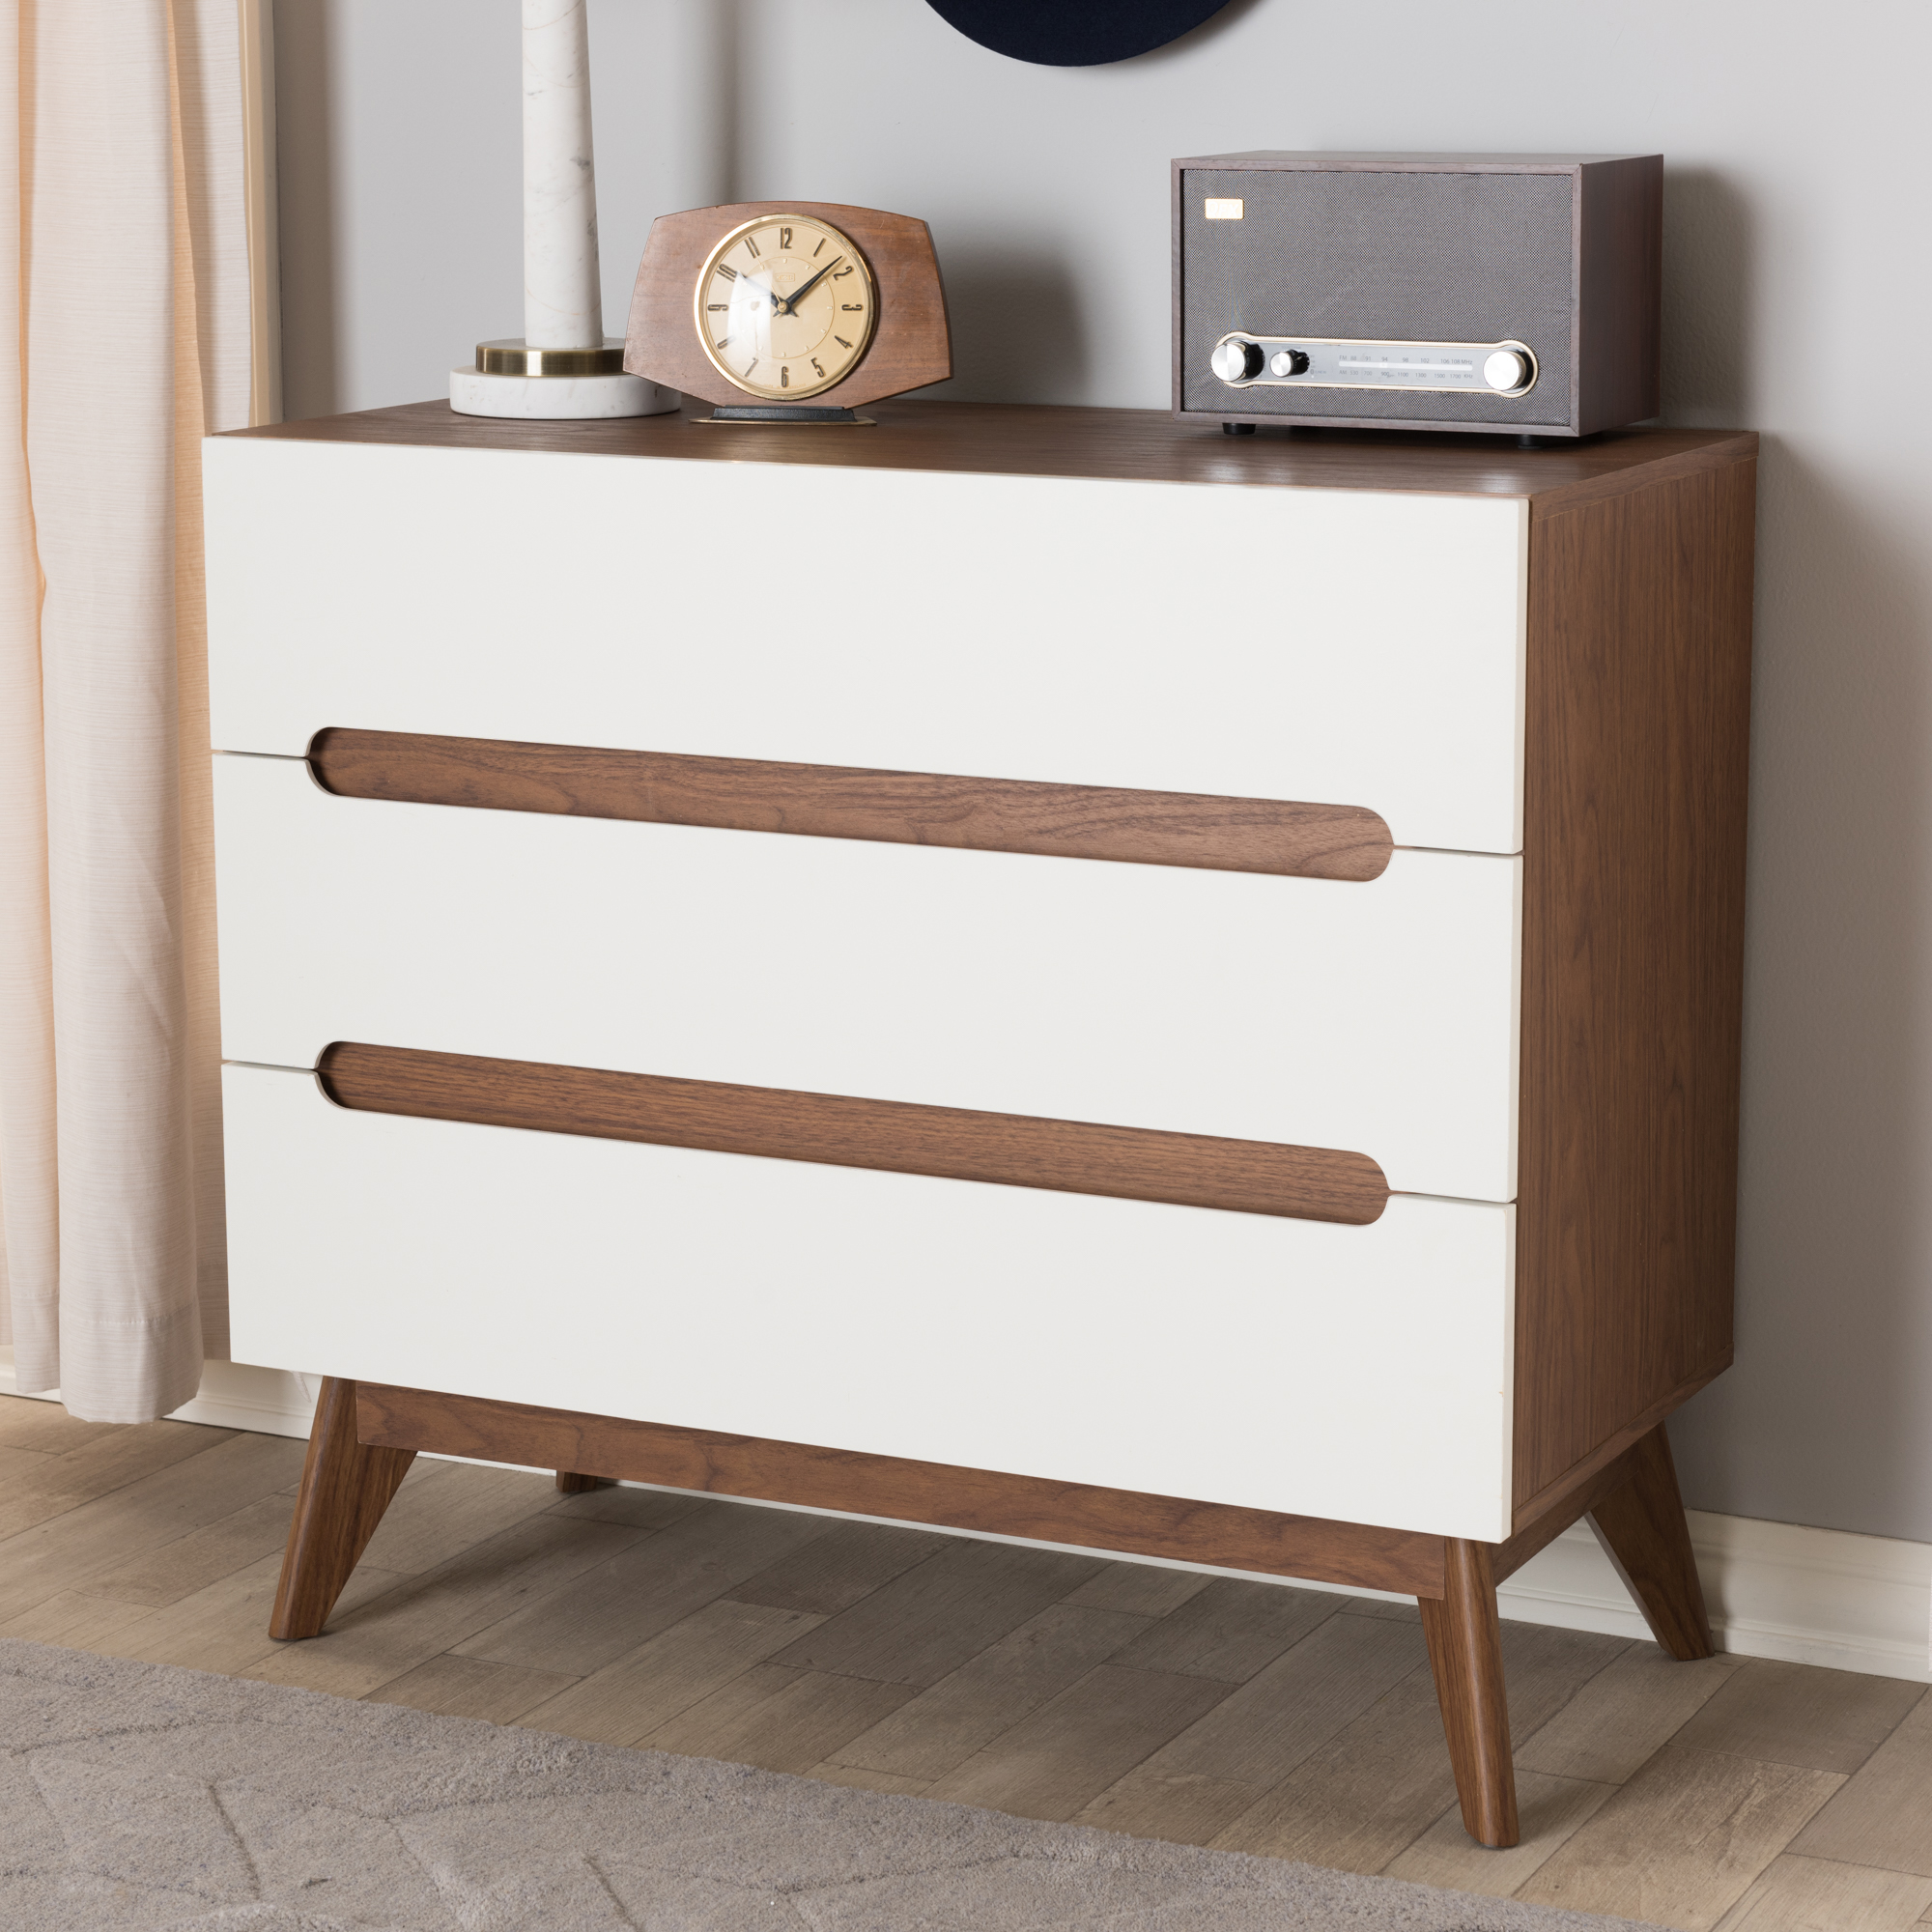 ... Baxton Studio Calypso Mid Century Modern White And Walnut Wood 3 Drawer  Storage Chest ...